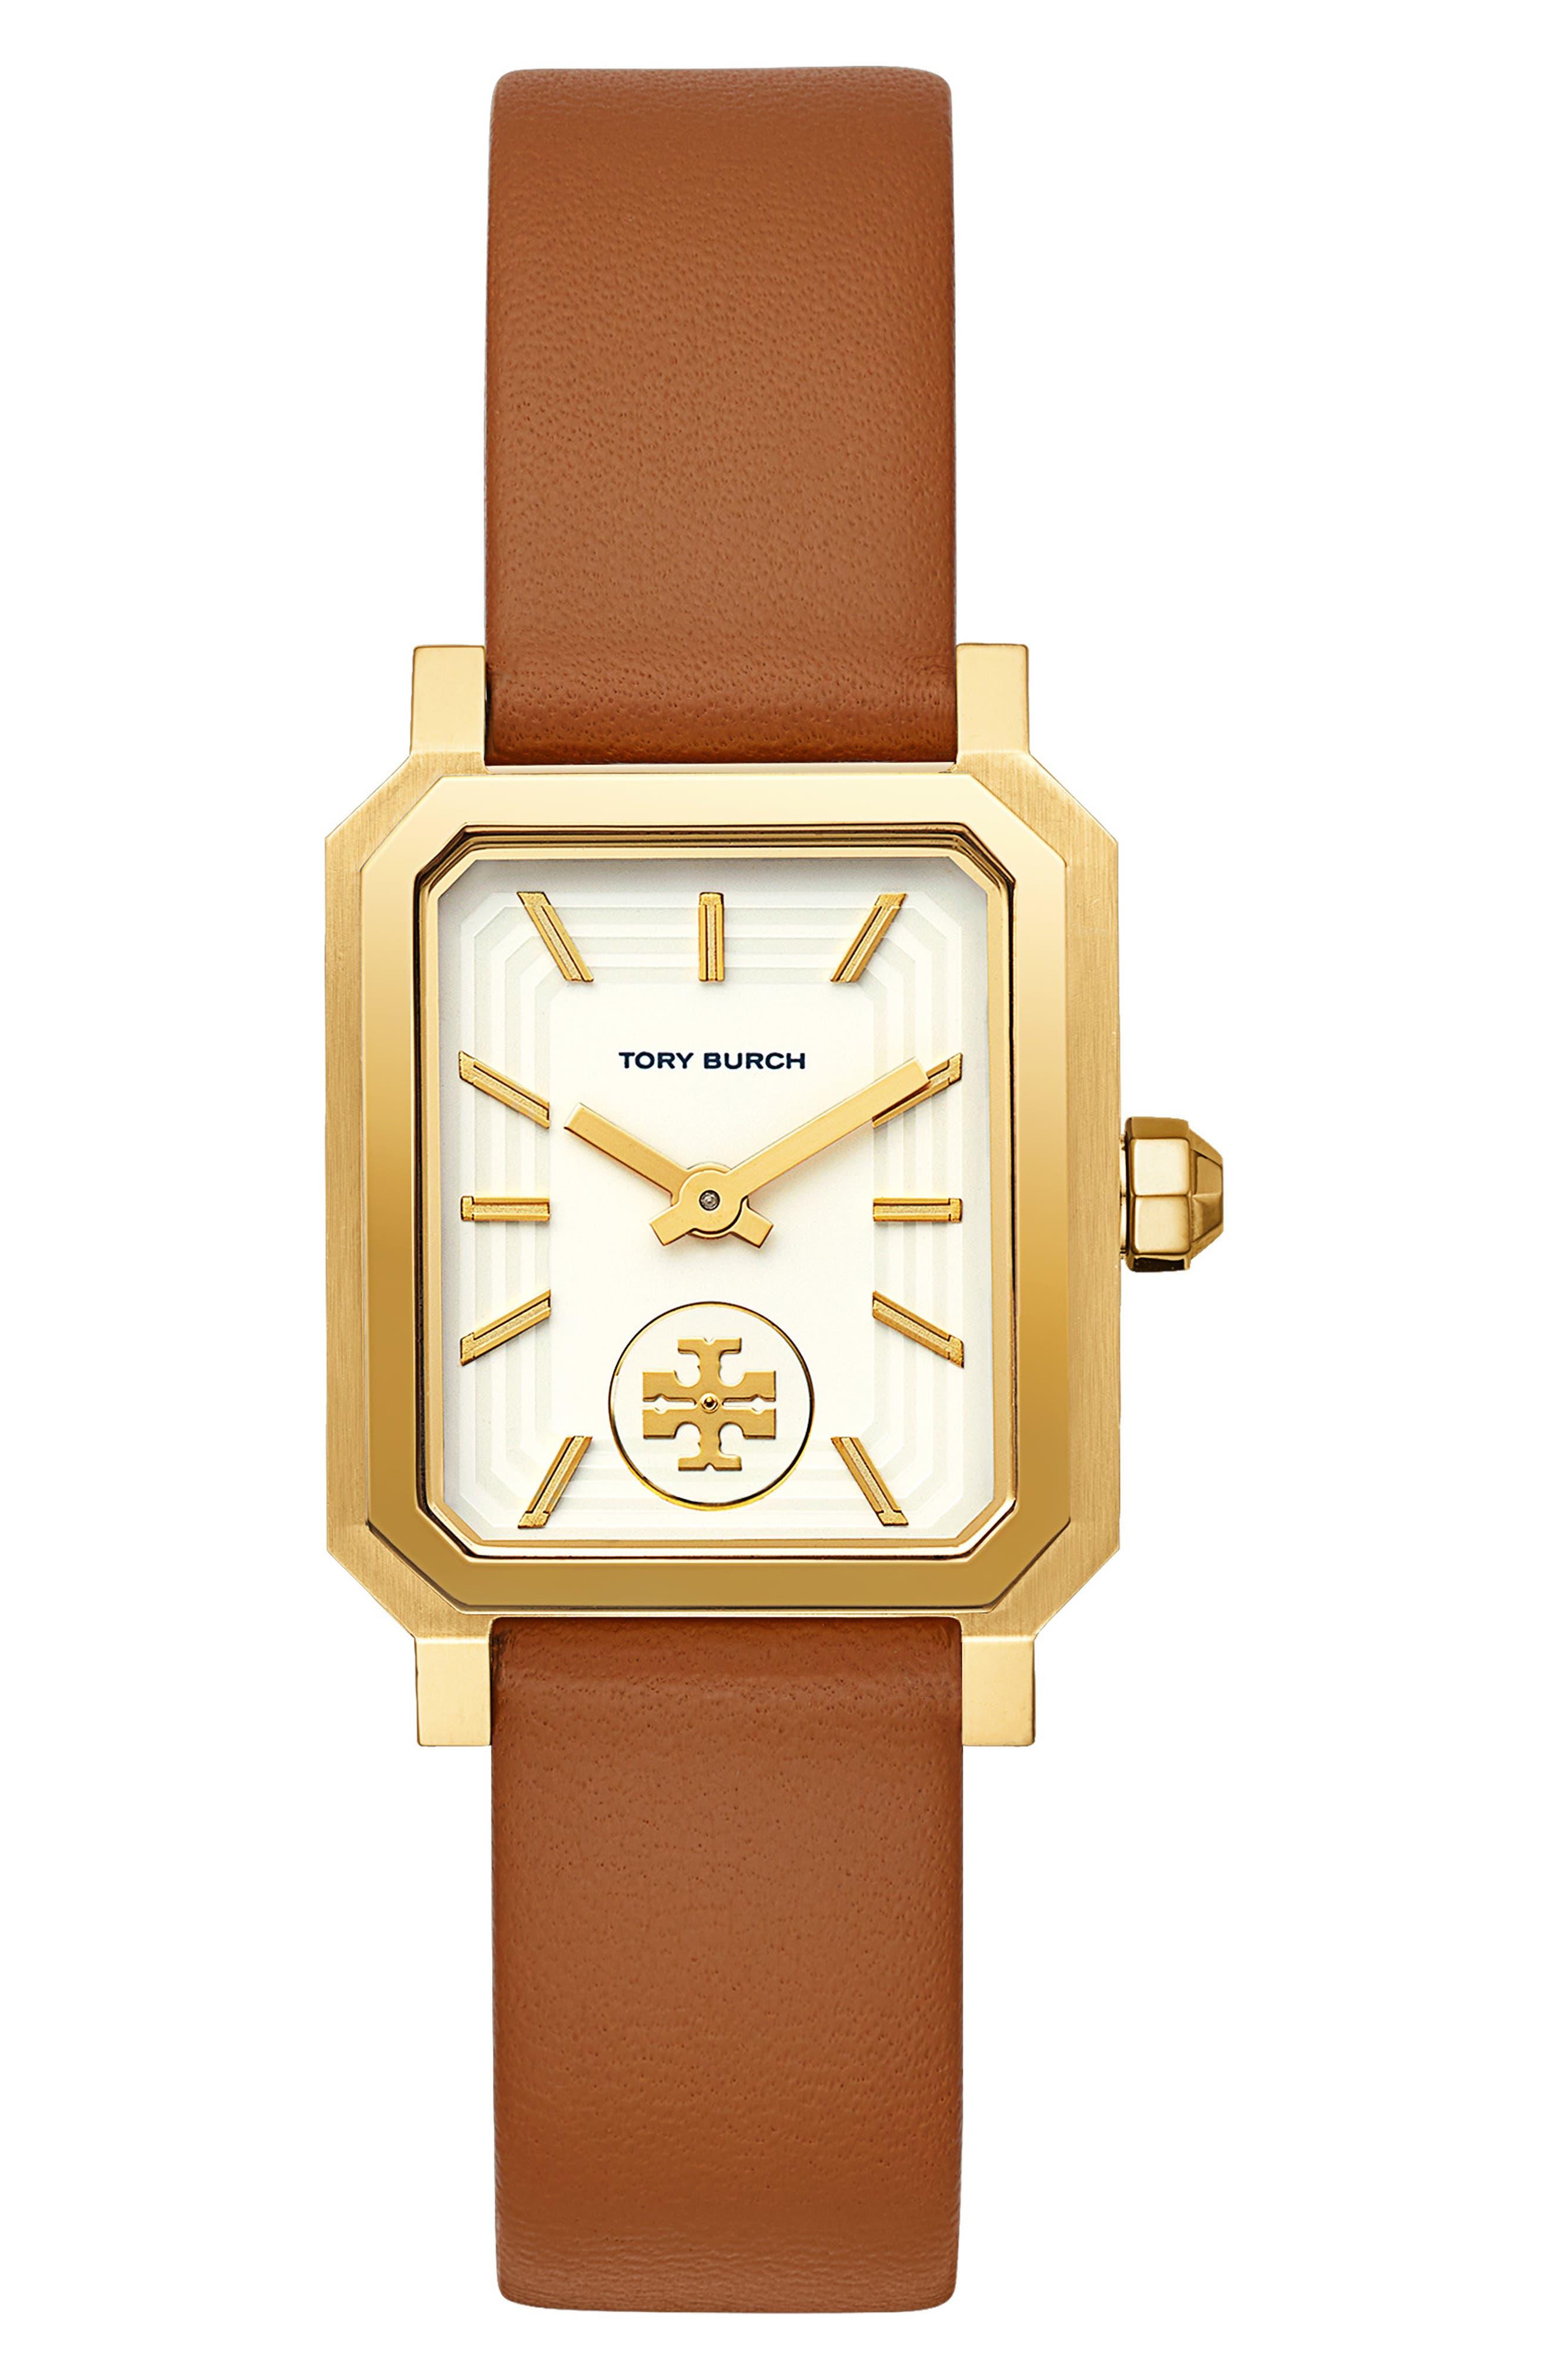 64c3bdf199aa Tory Burch Watches